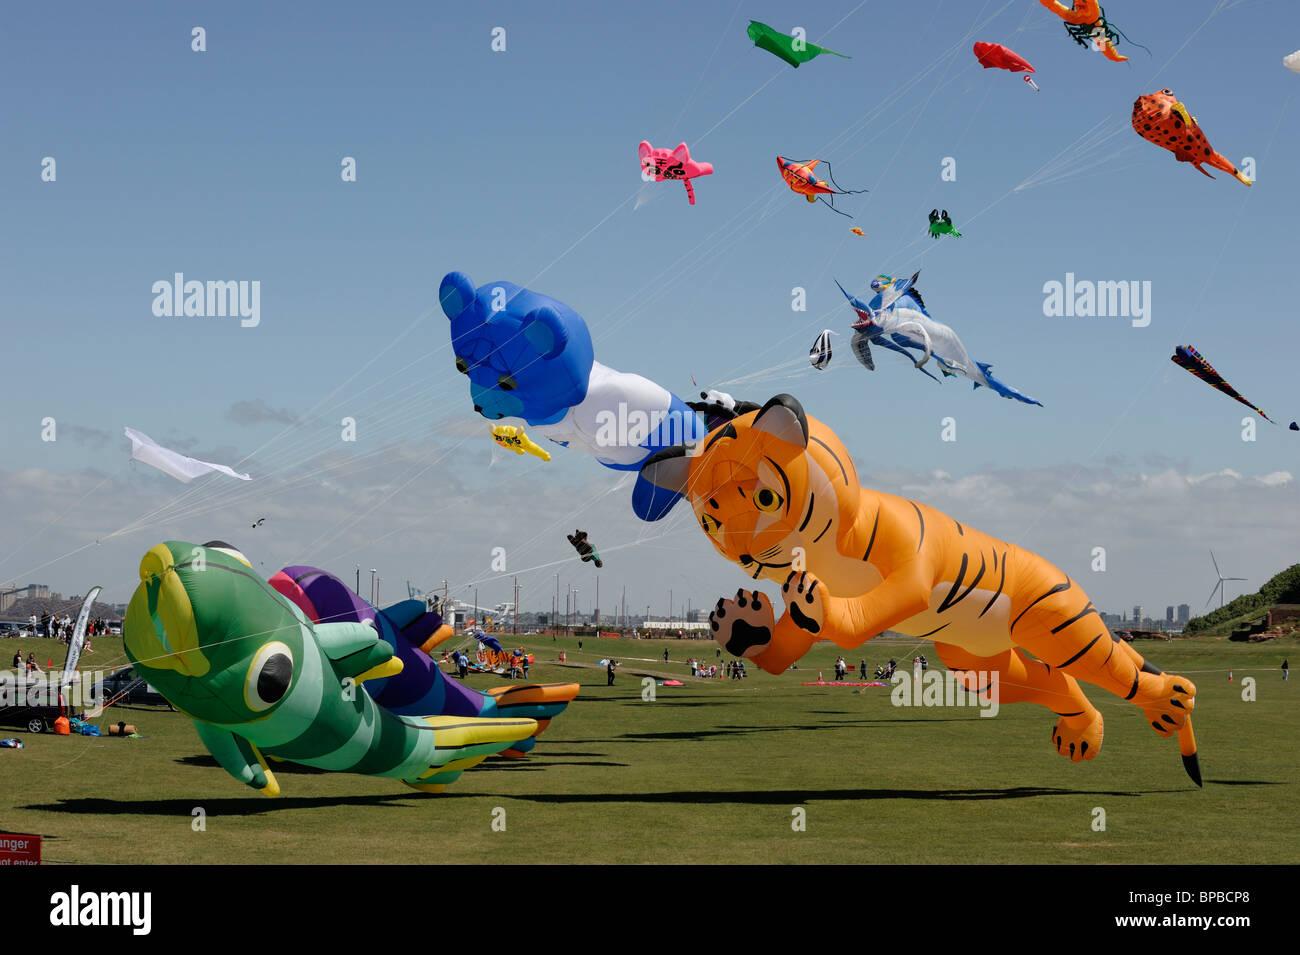 Wirral International Kite Festival, New Brighton 2010 - Stock Image